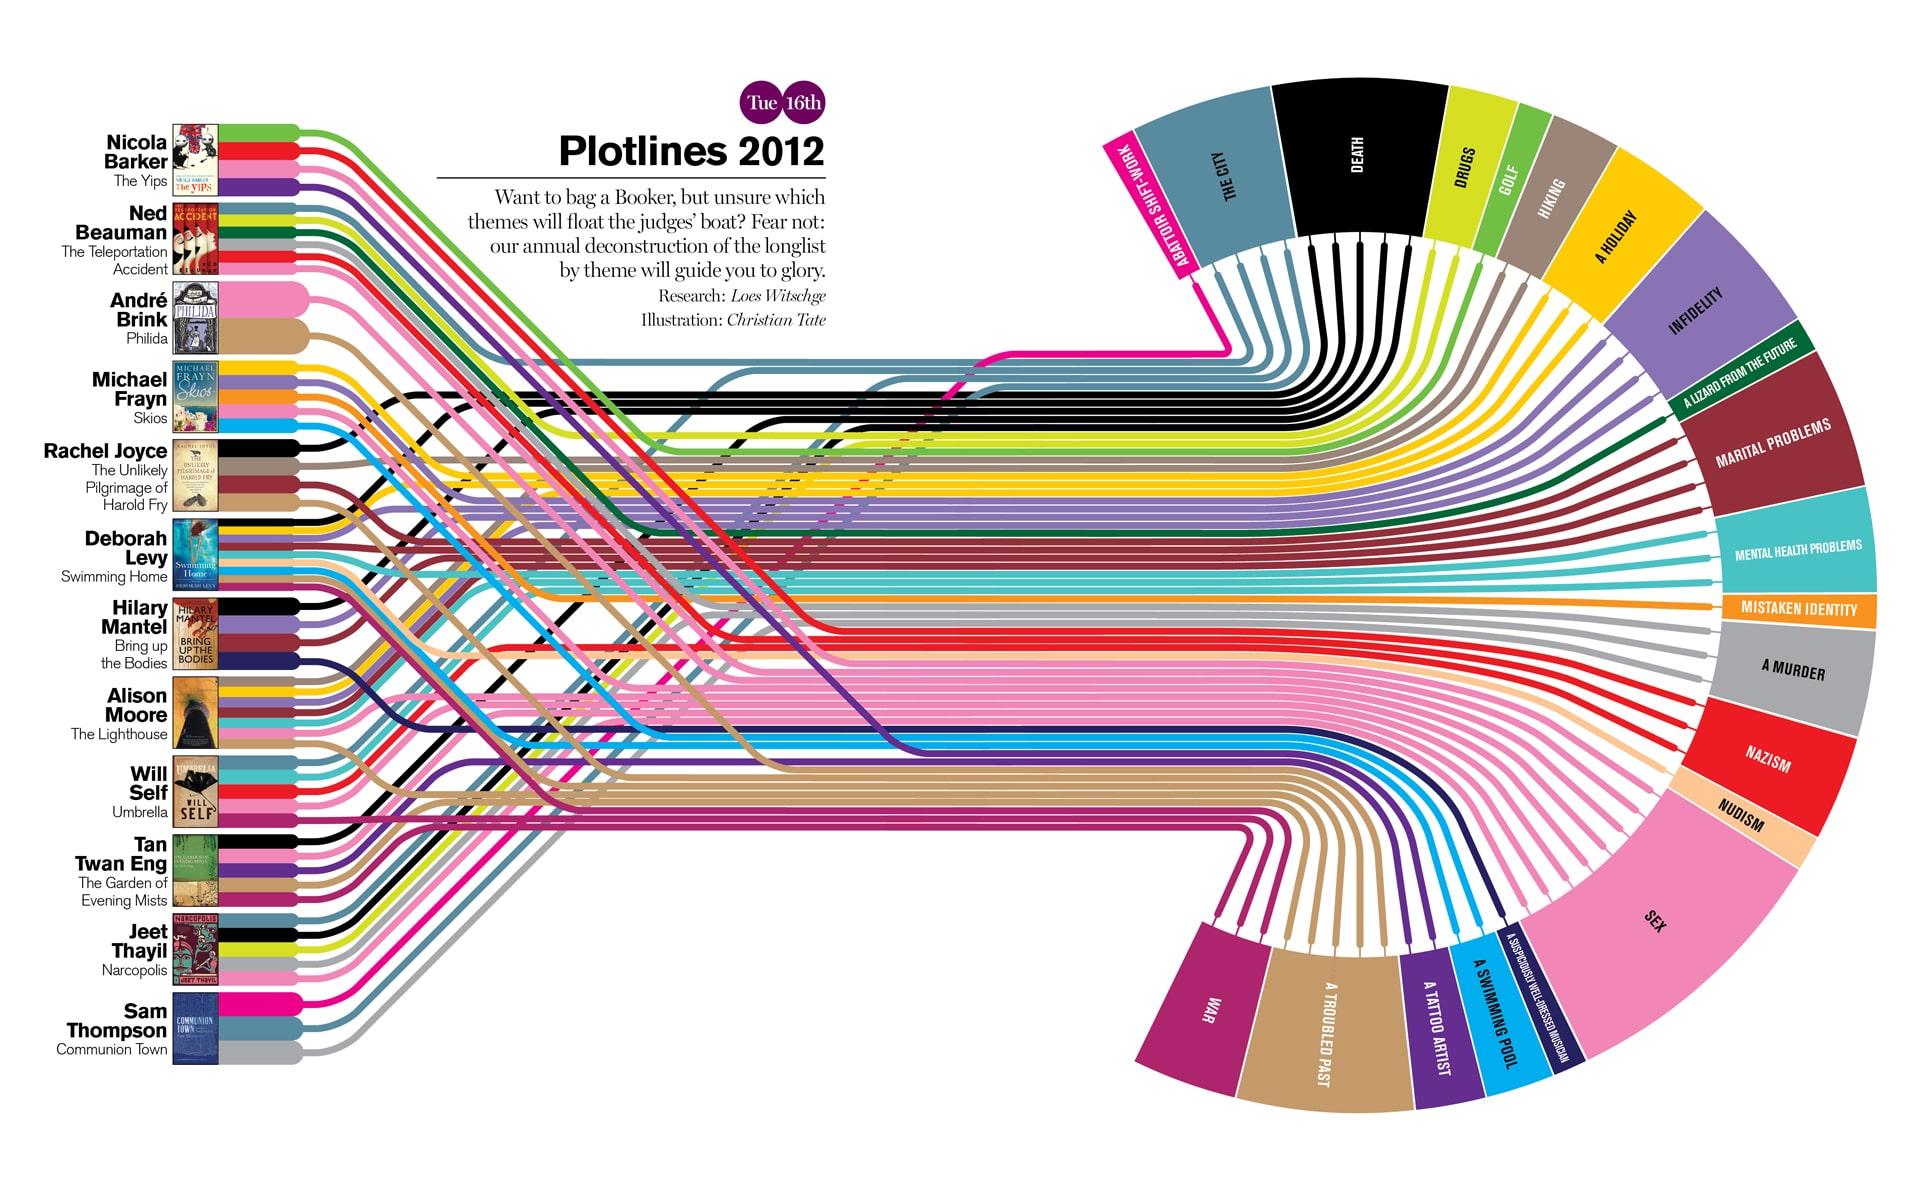 Plotlines 2012